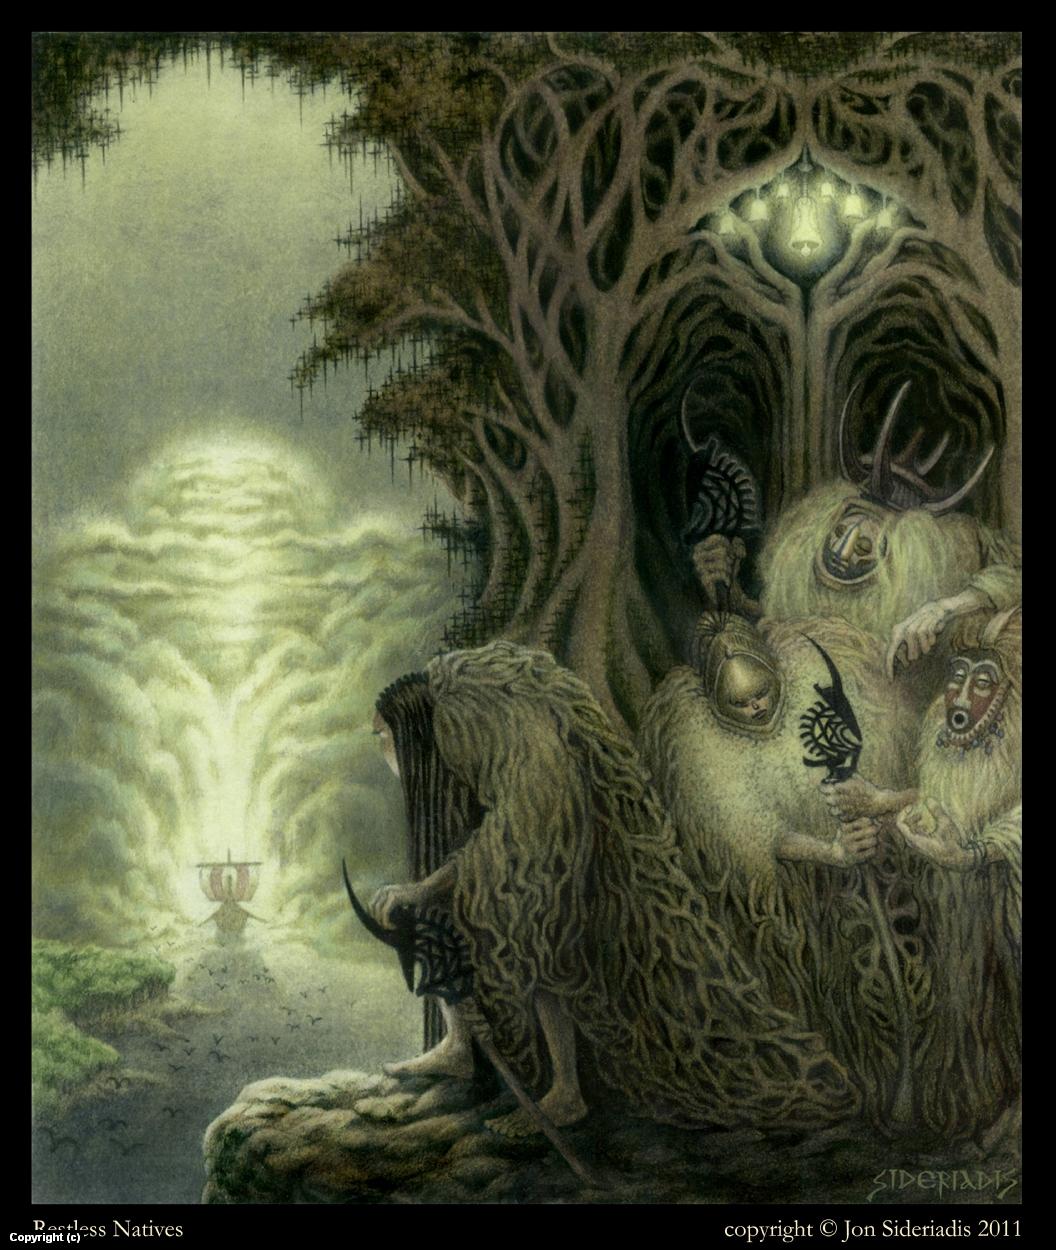 Restless Natives Artwork by Jon Sideriadis